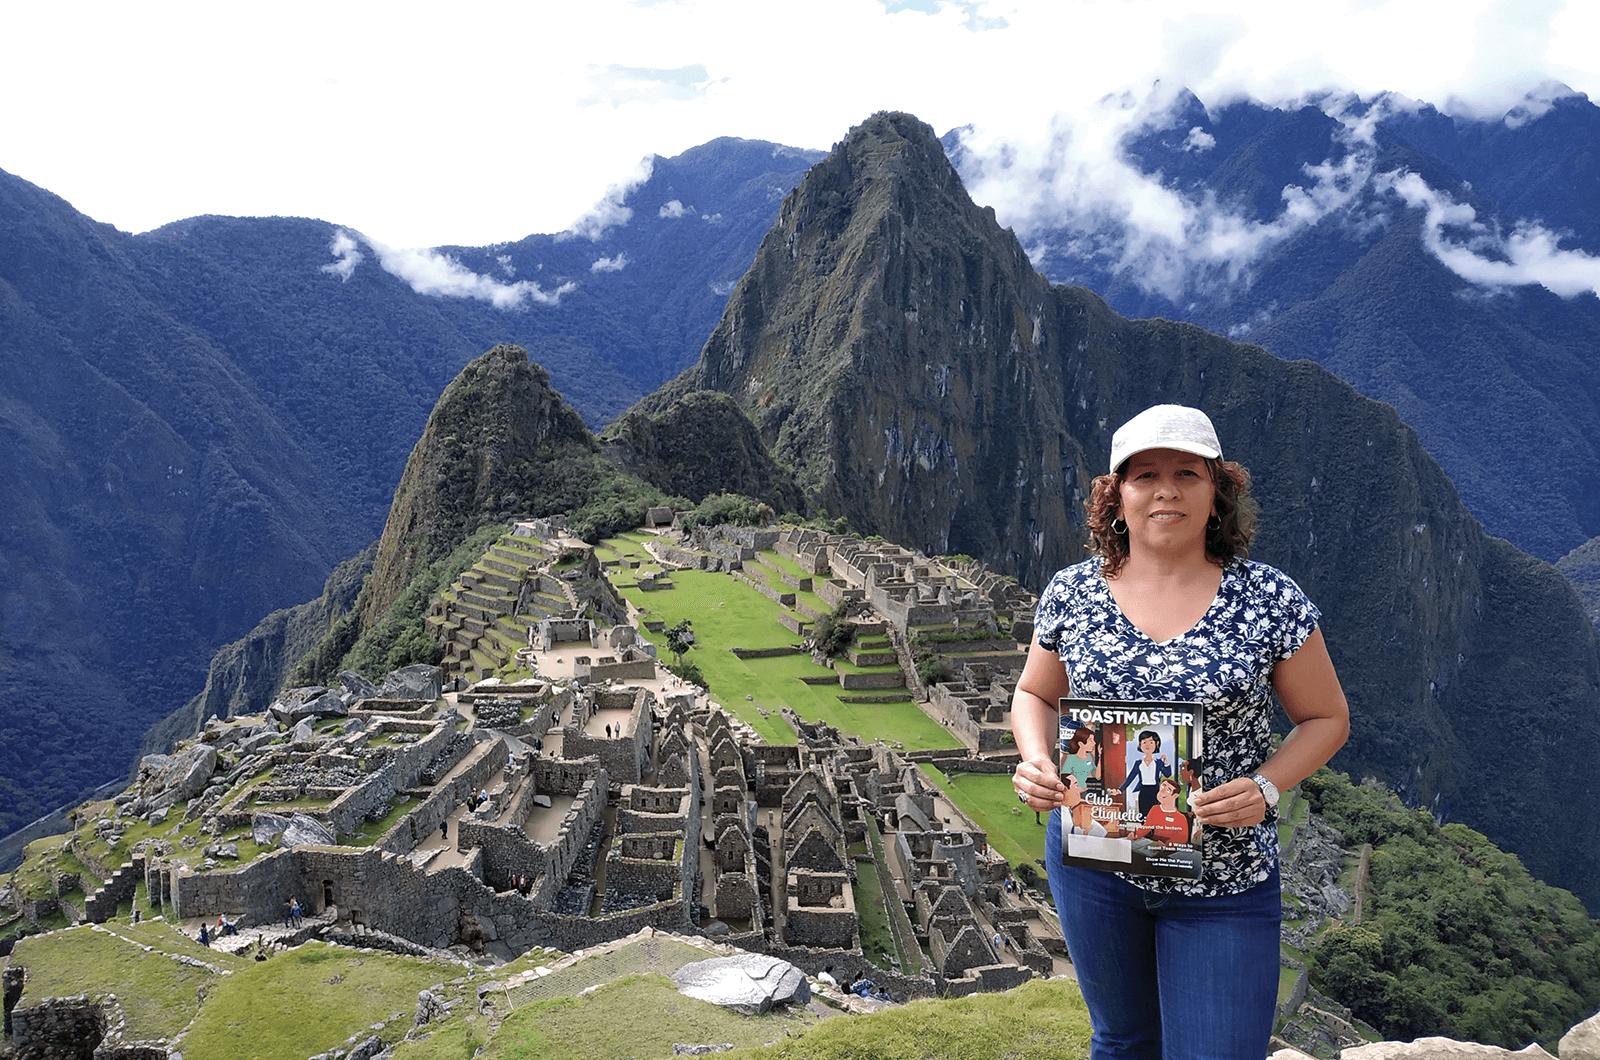 Alba Lucia Hincapie, CC, ALB, of Barcelona, Spain, visits the ruins of Machu Picchu, the 15th-century Inca citadel located 2,430-meters/7,790-feet above sea level in Cusco, Perú.